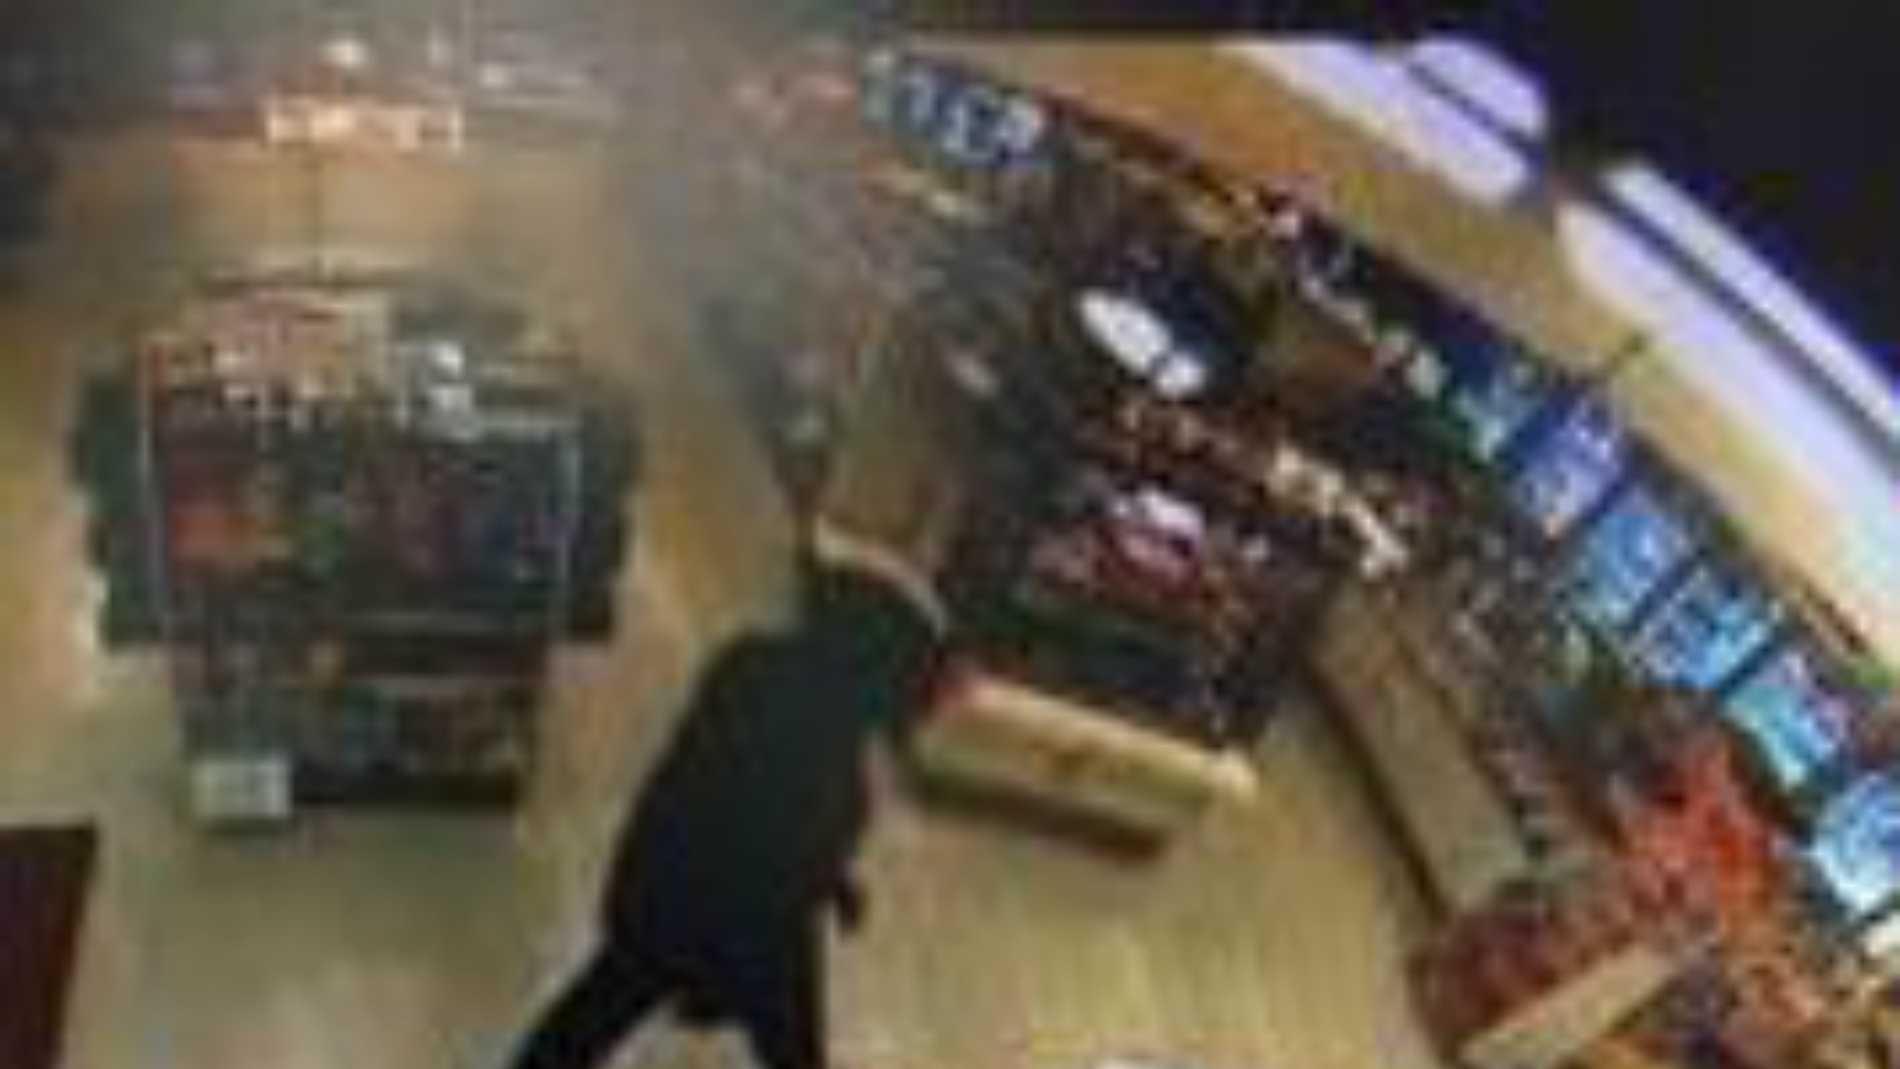 7-11 robber in Morgan Hill